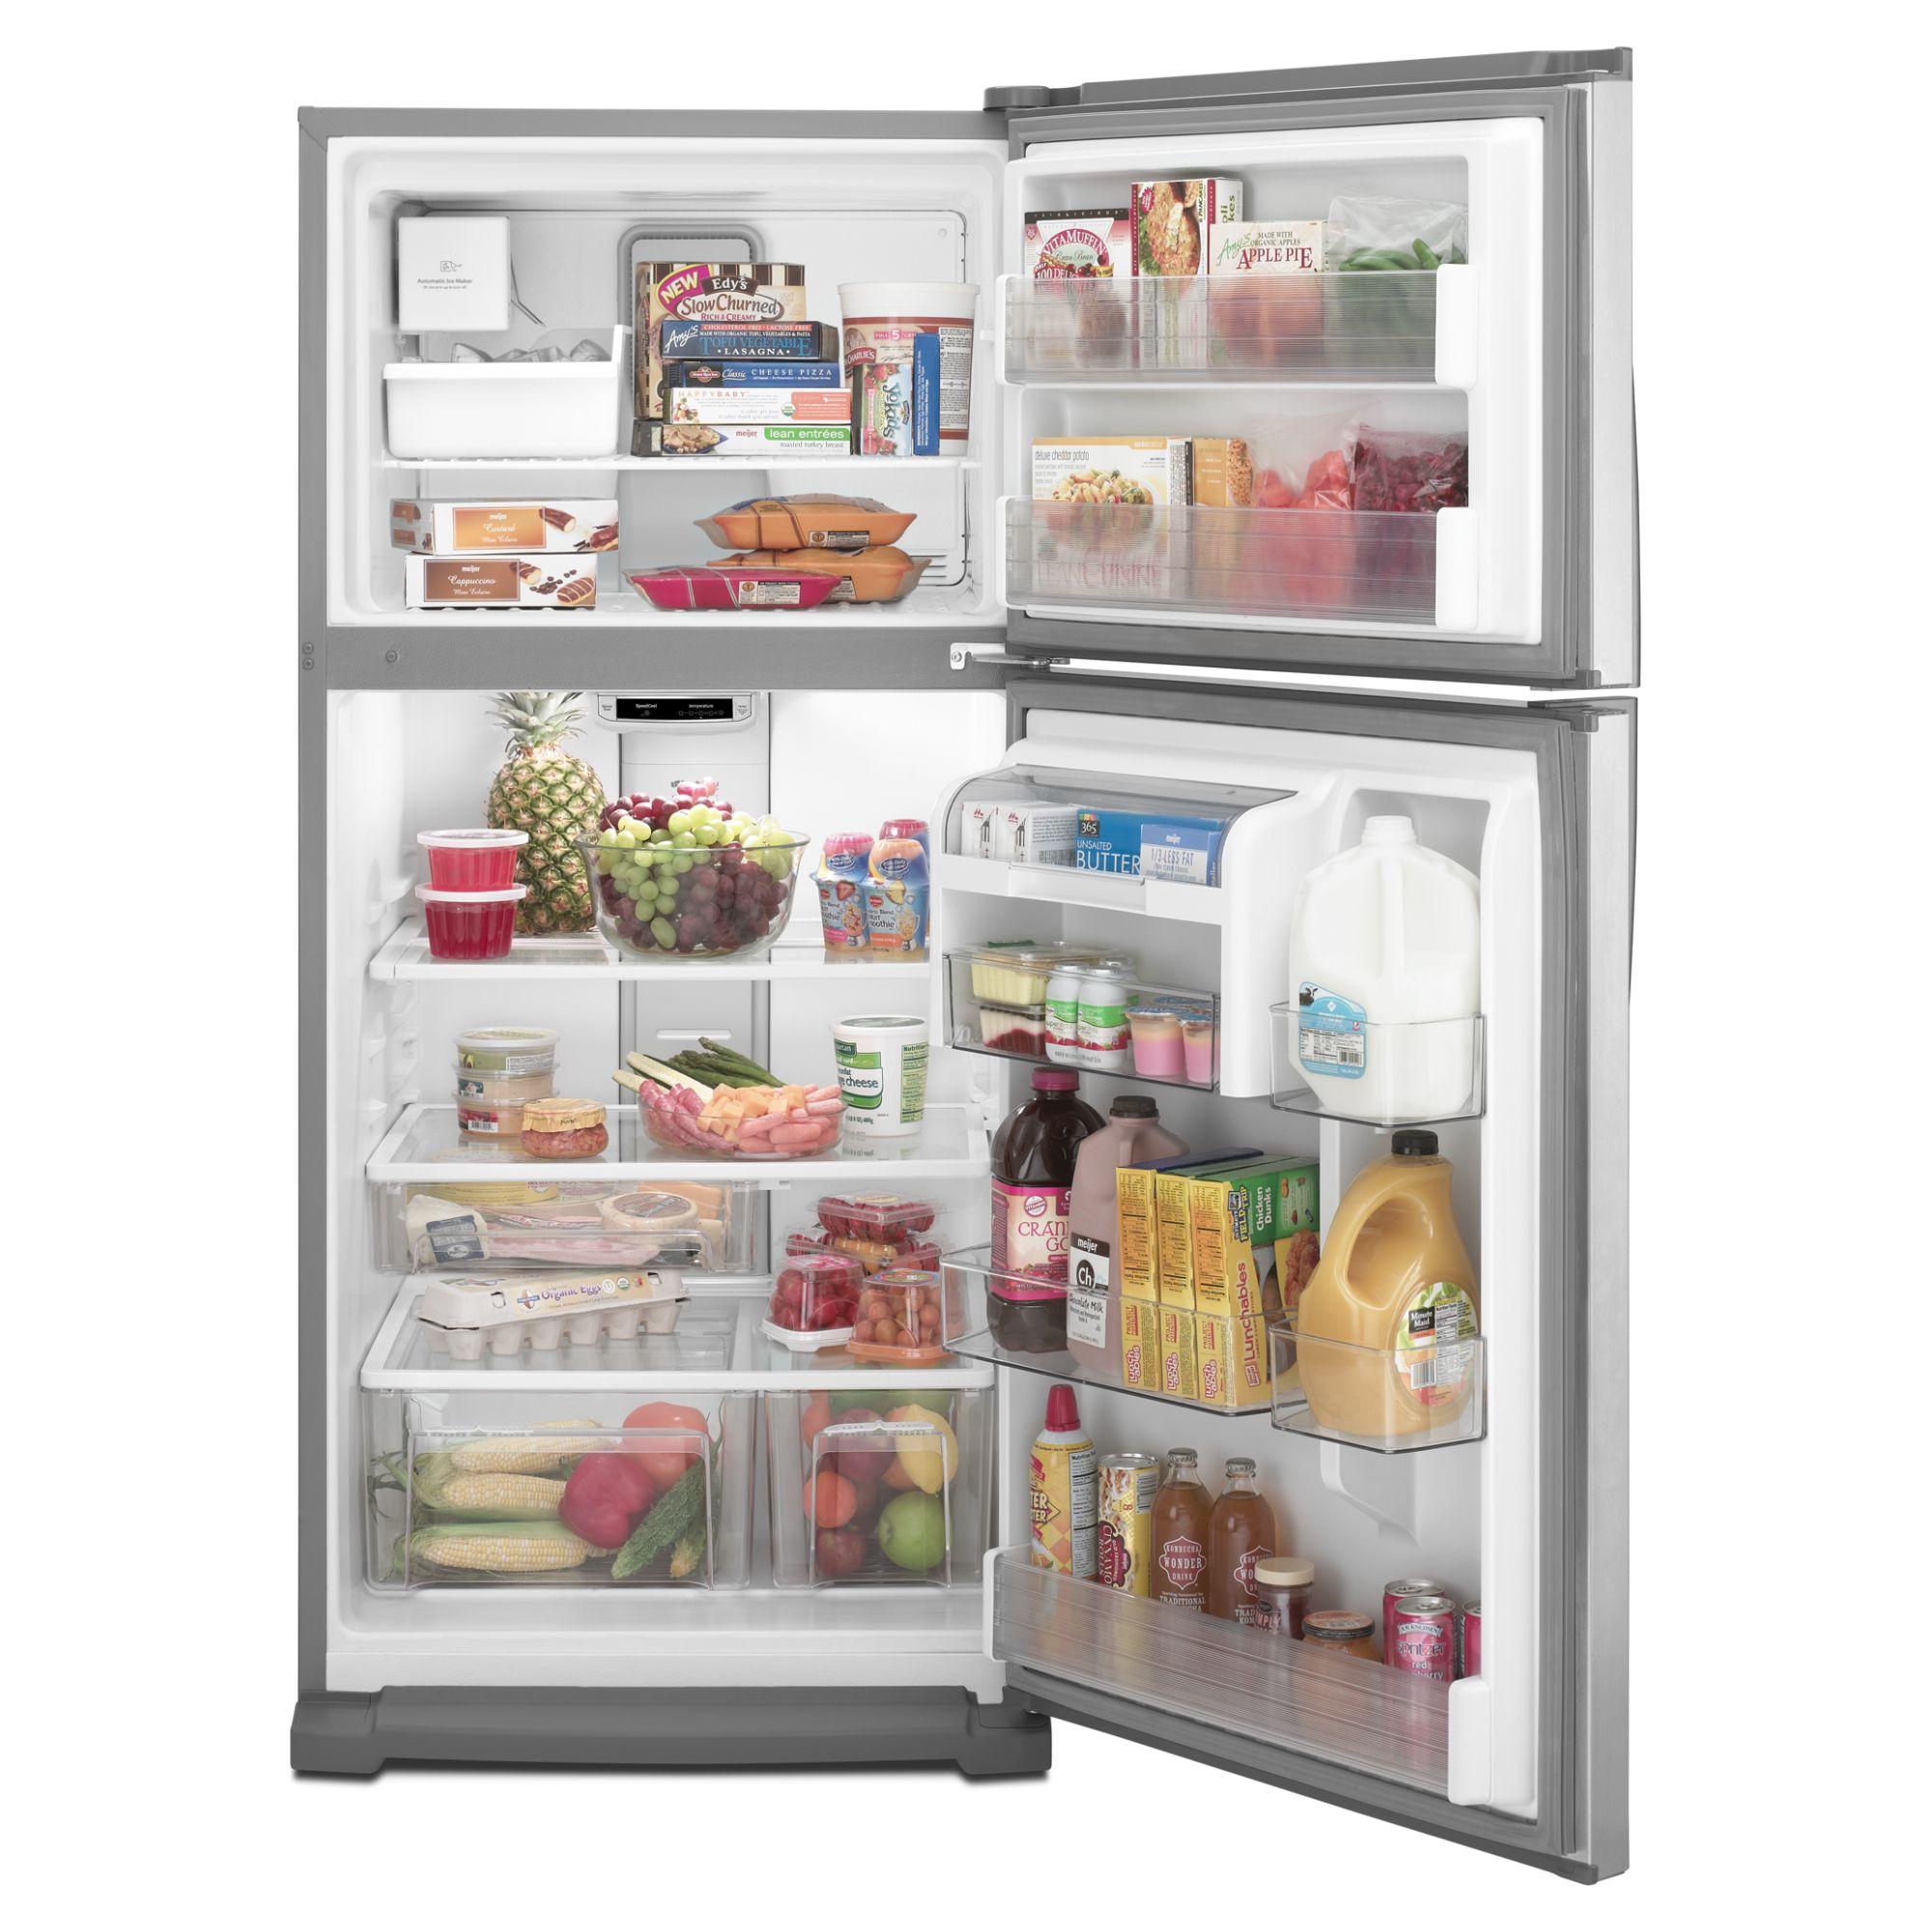 Maytag 18.9 cu. ft. Top-Freezer Refrigerator w/ Strongbox™ Door Bins - Stainless Steel